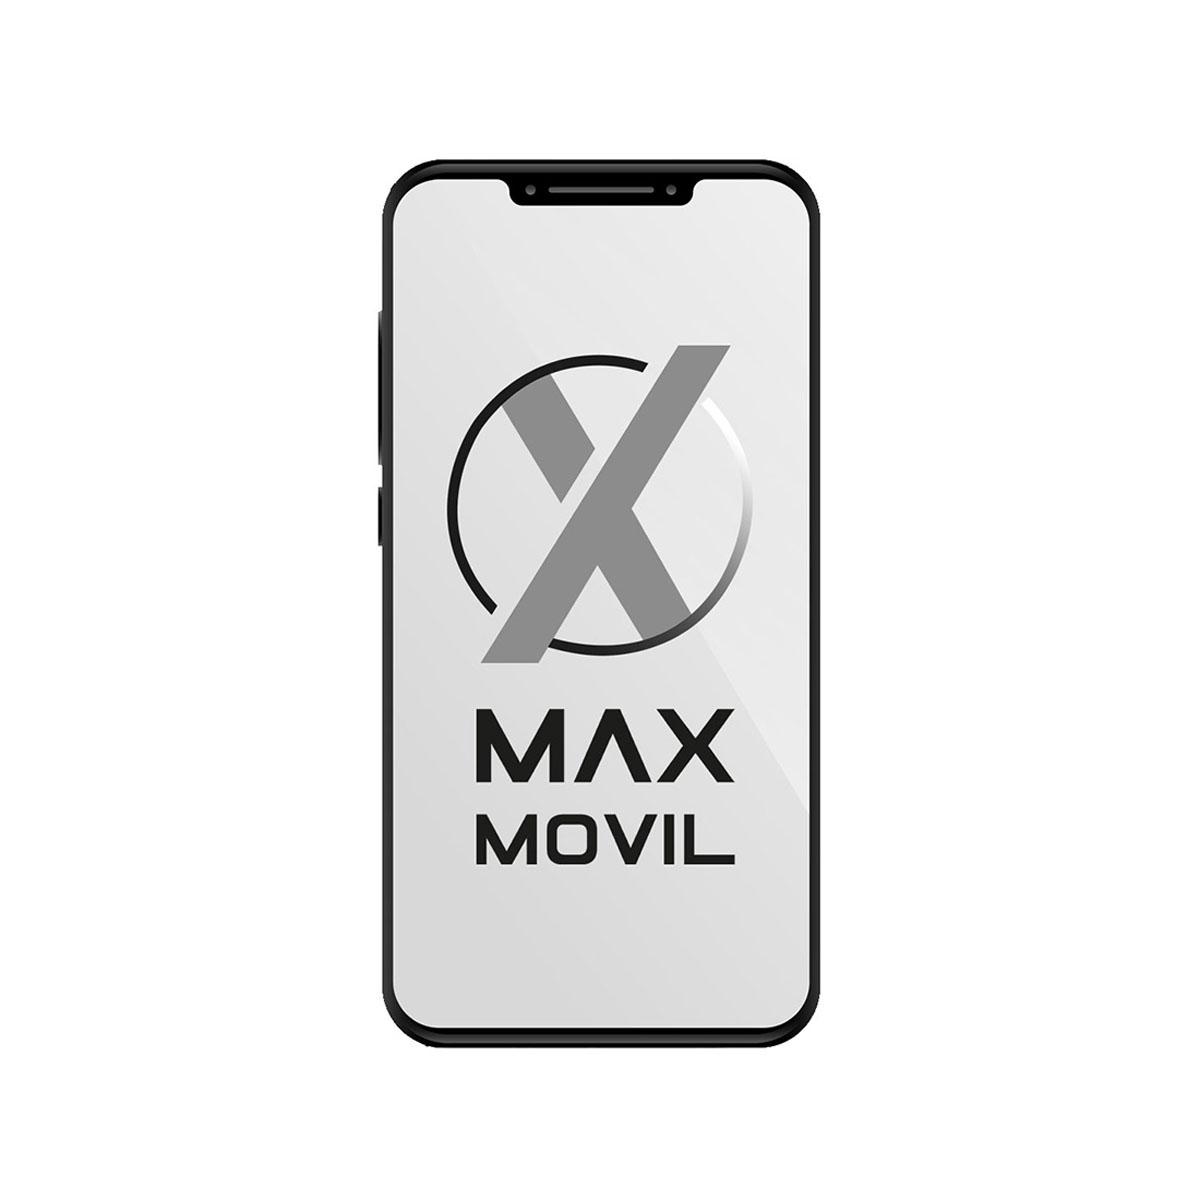 Apple Watch Series 5 Nike GPS + Cellular, Caja 40mm Aluminio Plata y correa deportiva platino puro/negro MX3V2TY/A